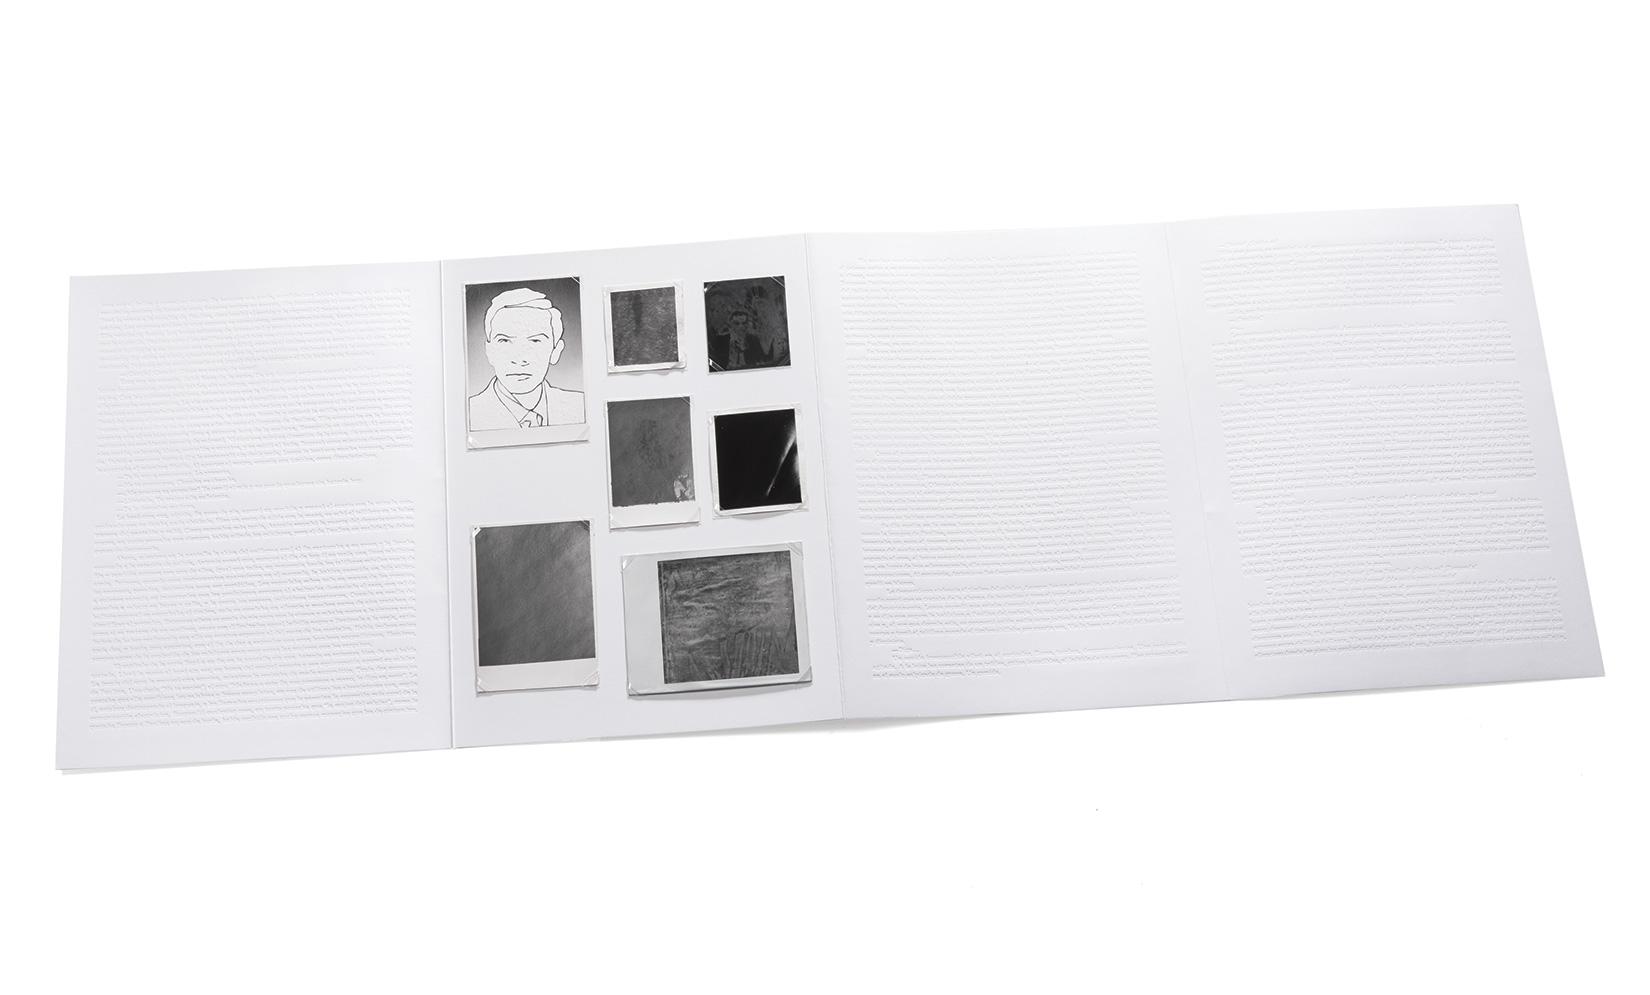 johanna-calle-olivier-andreotti-toluca-editions-04.jpg